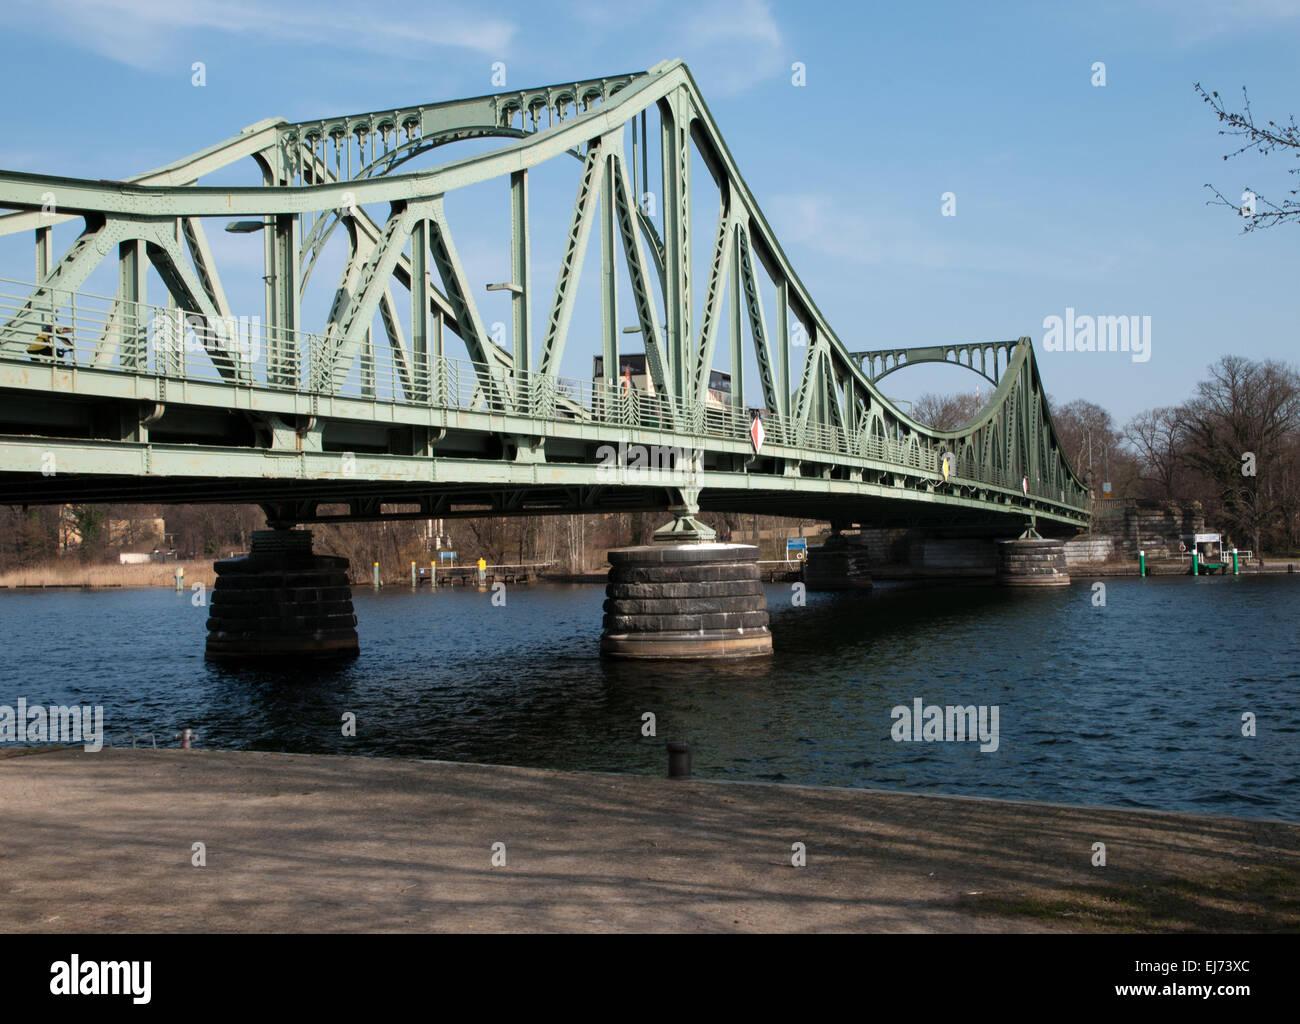 Glienicker Bruecke bridge, scene of Cold War spy exchanges - Stock Image